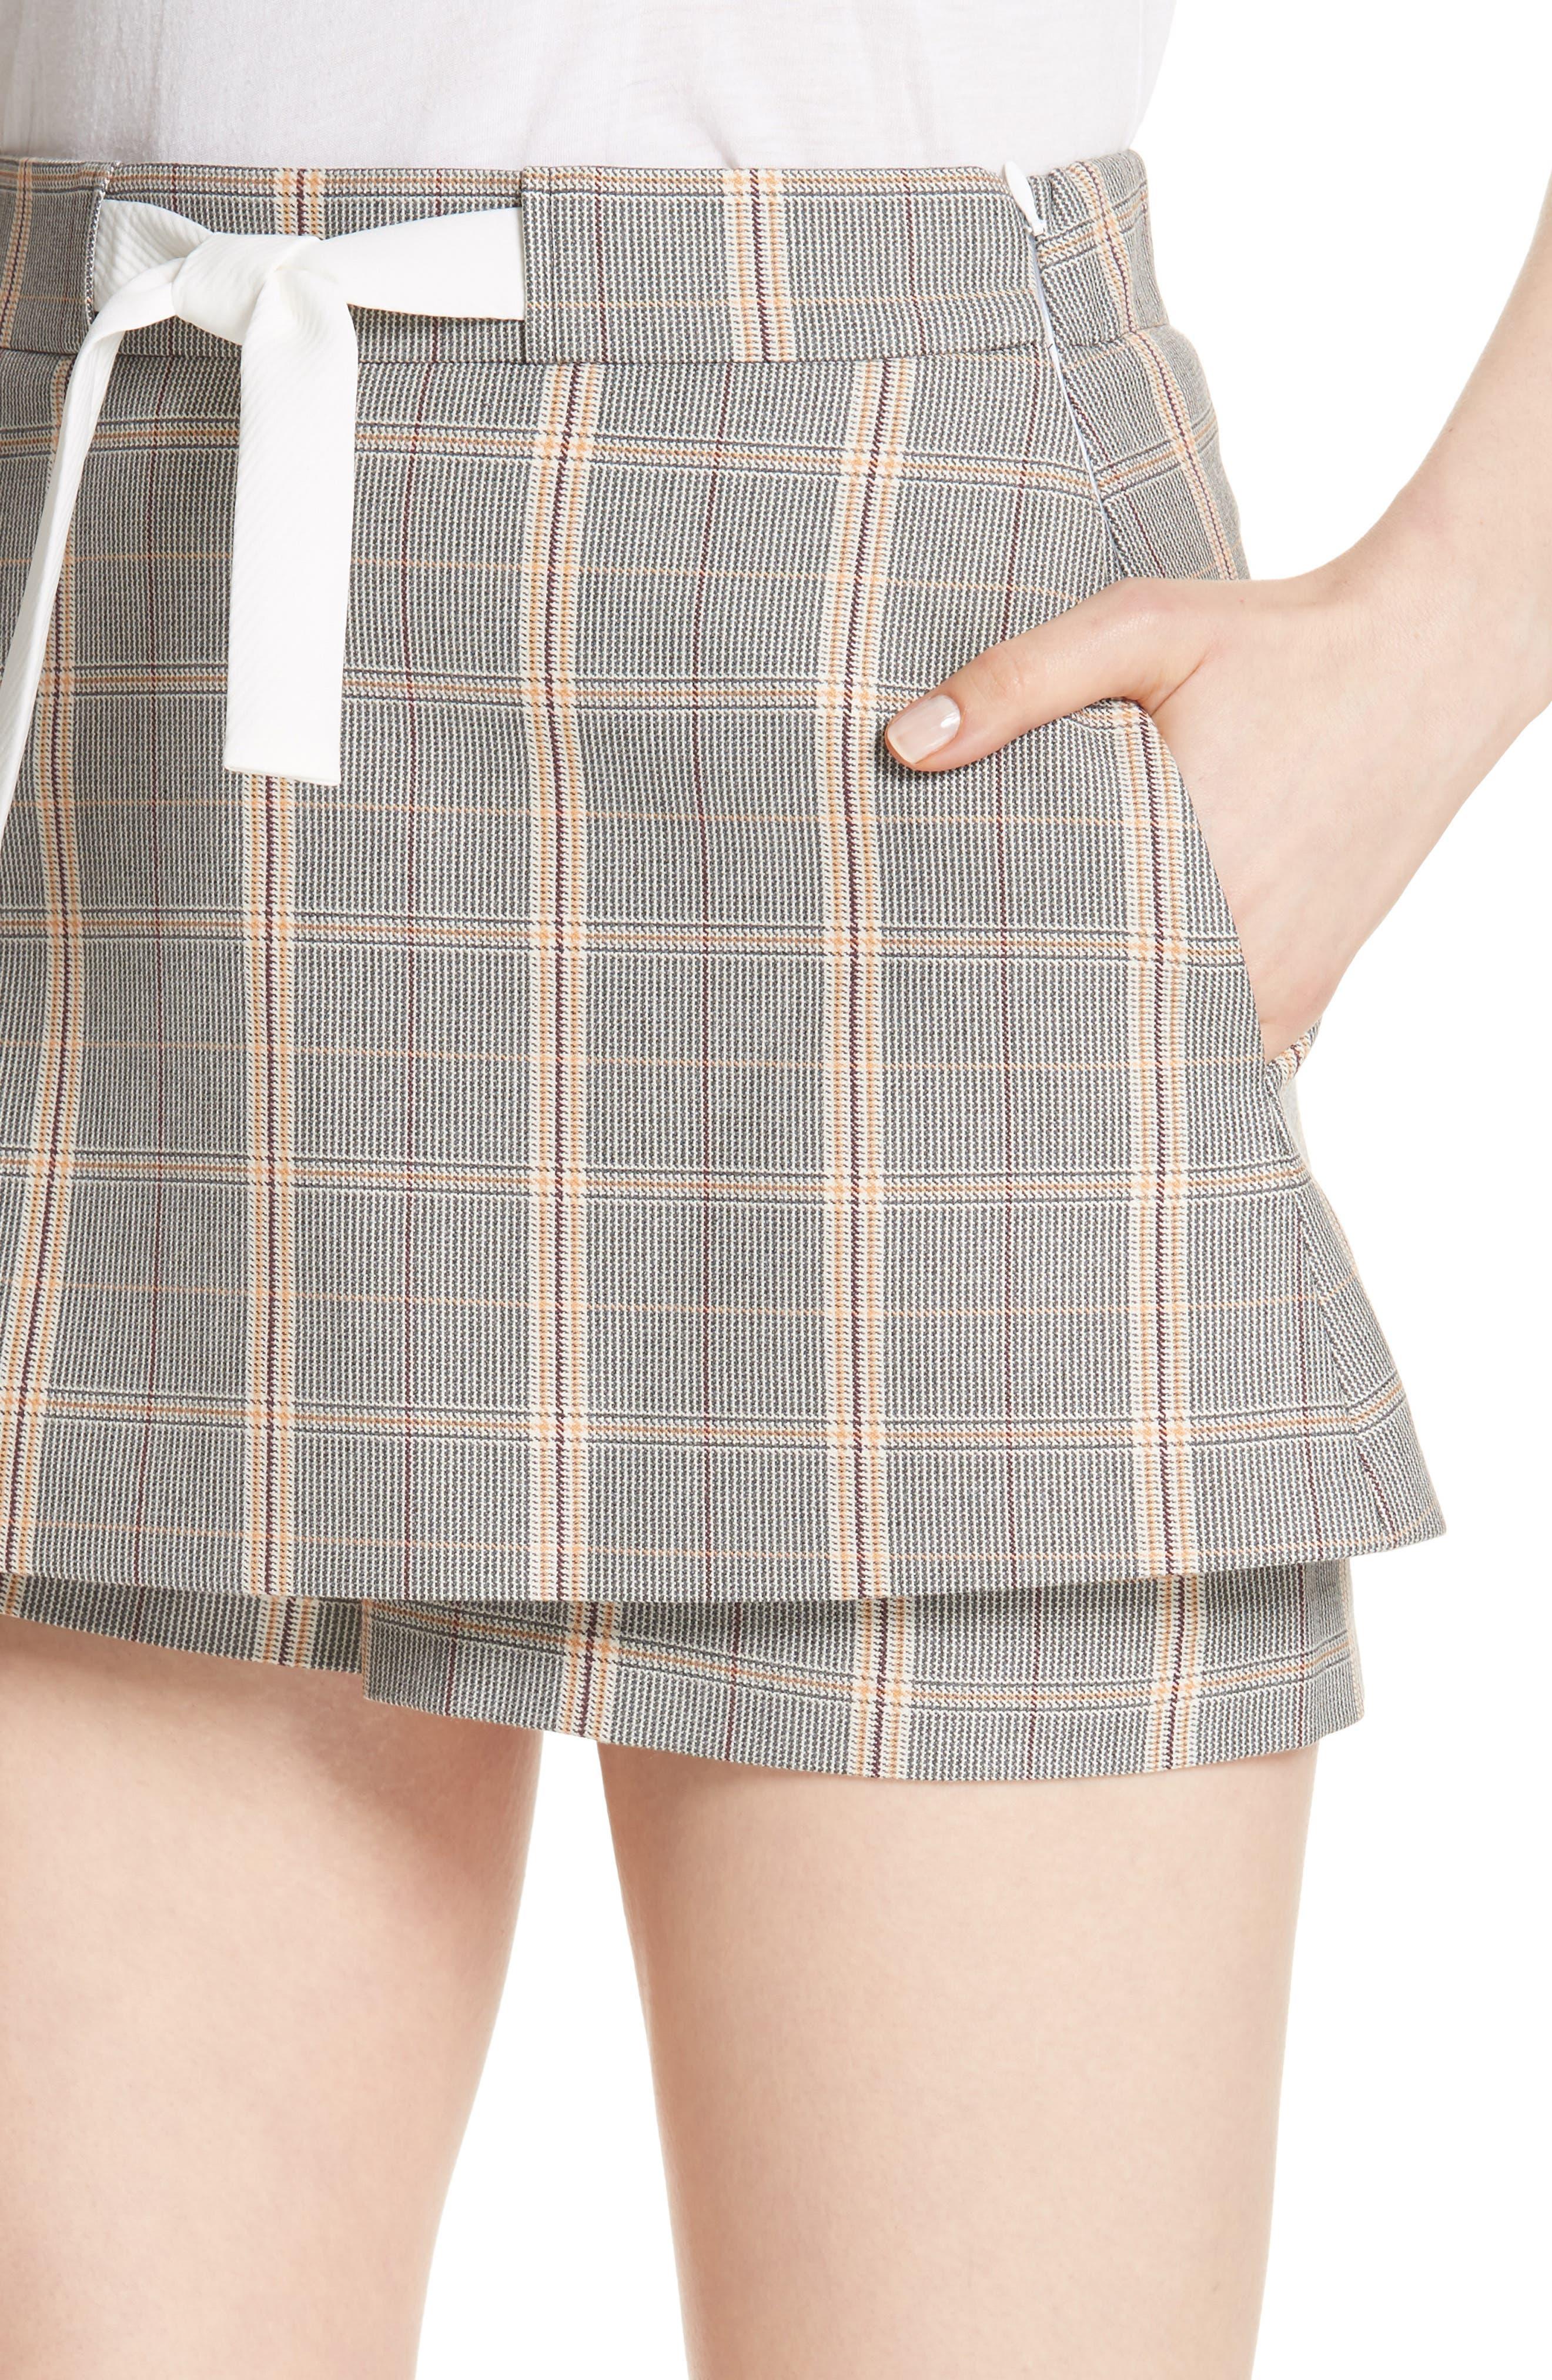 Plaid Skirt Front Shorts,                             Alternate thumbnail 4, color,                             020